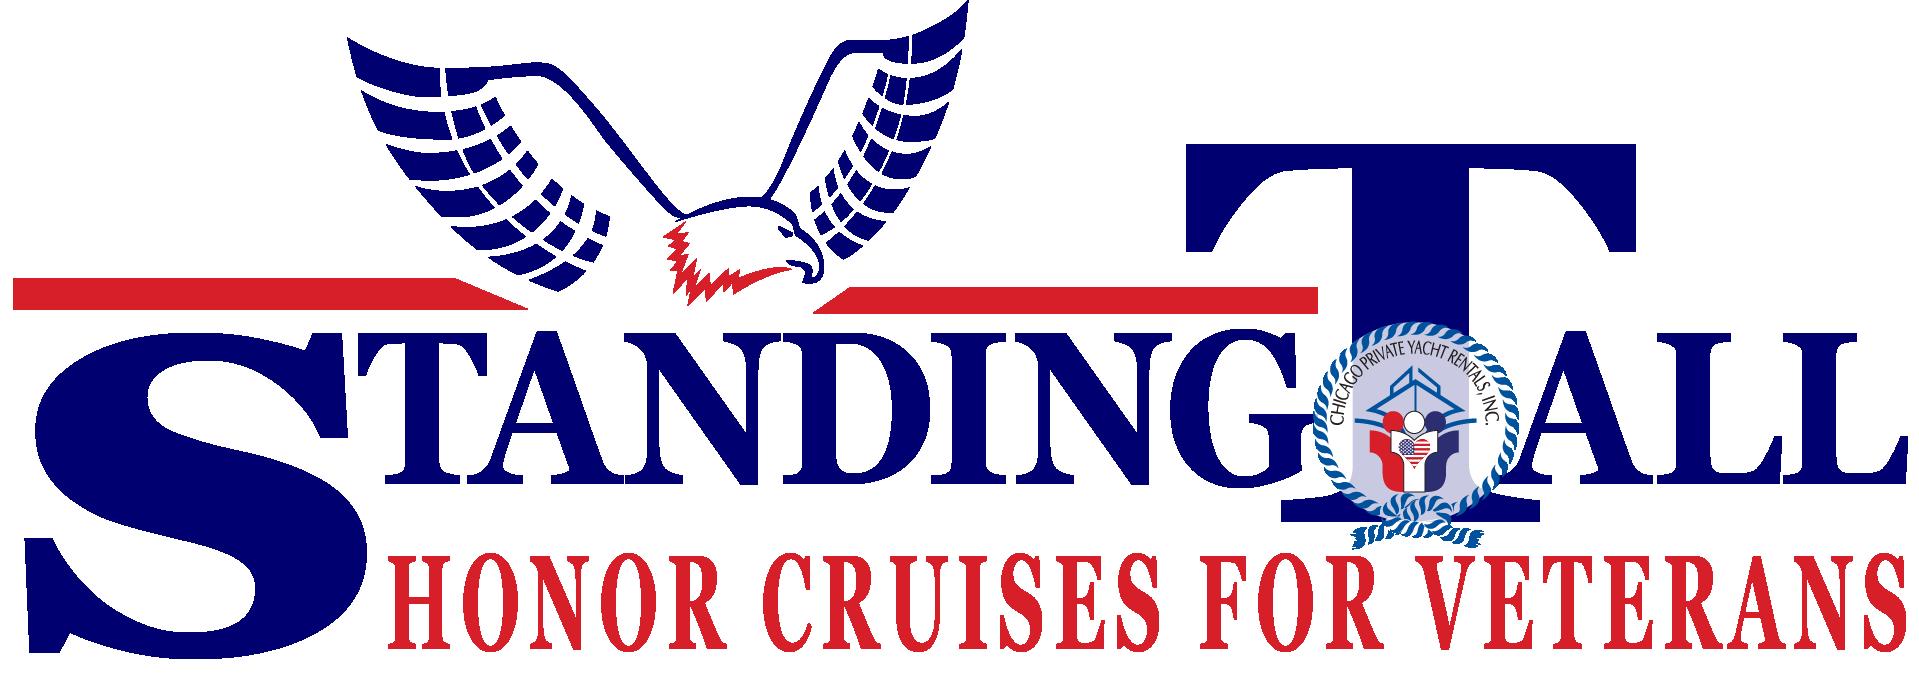 Standing Tall Honor Cruises for Veterans